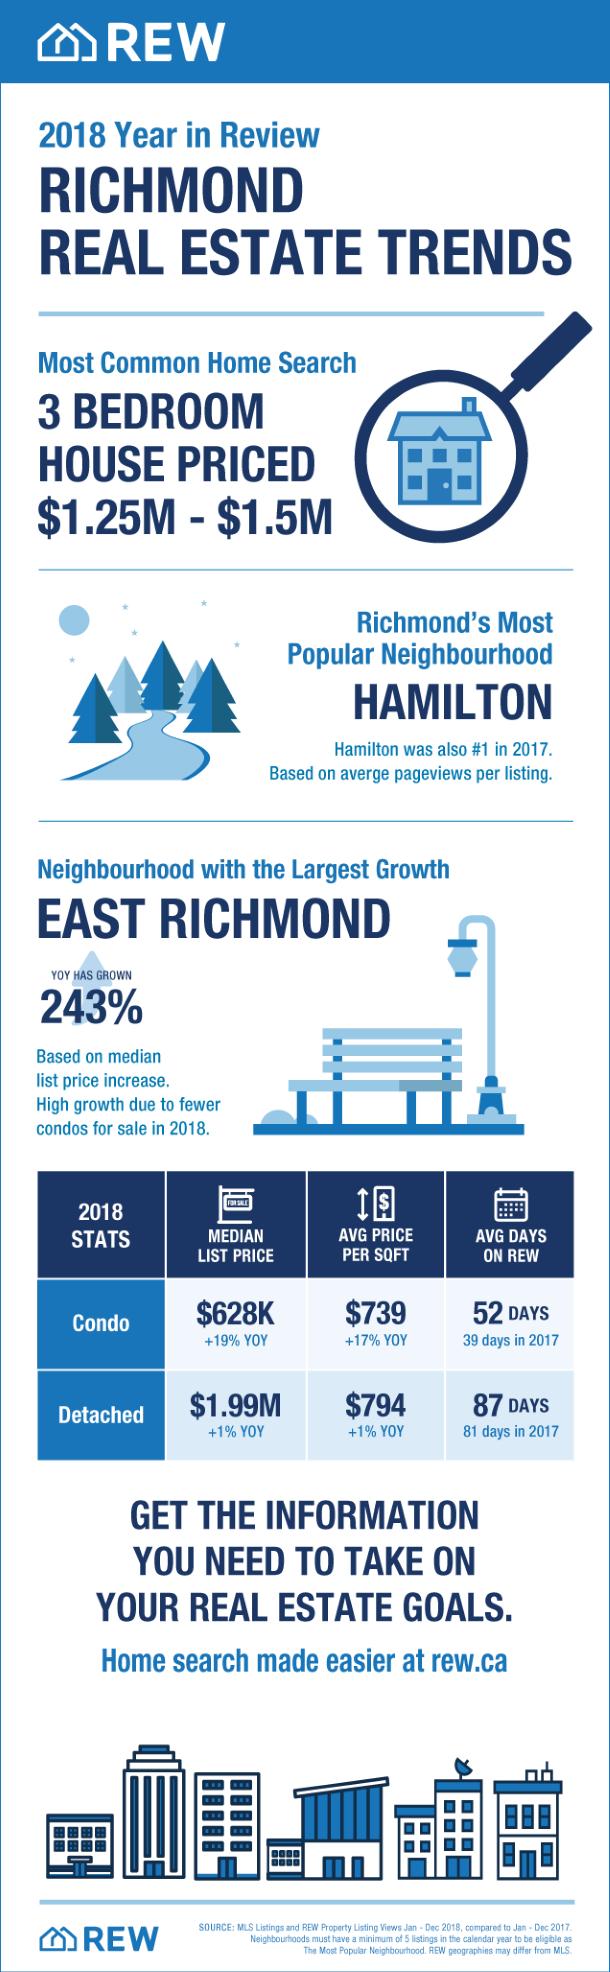 Richmond Real Estate Trends 2018